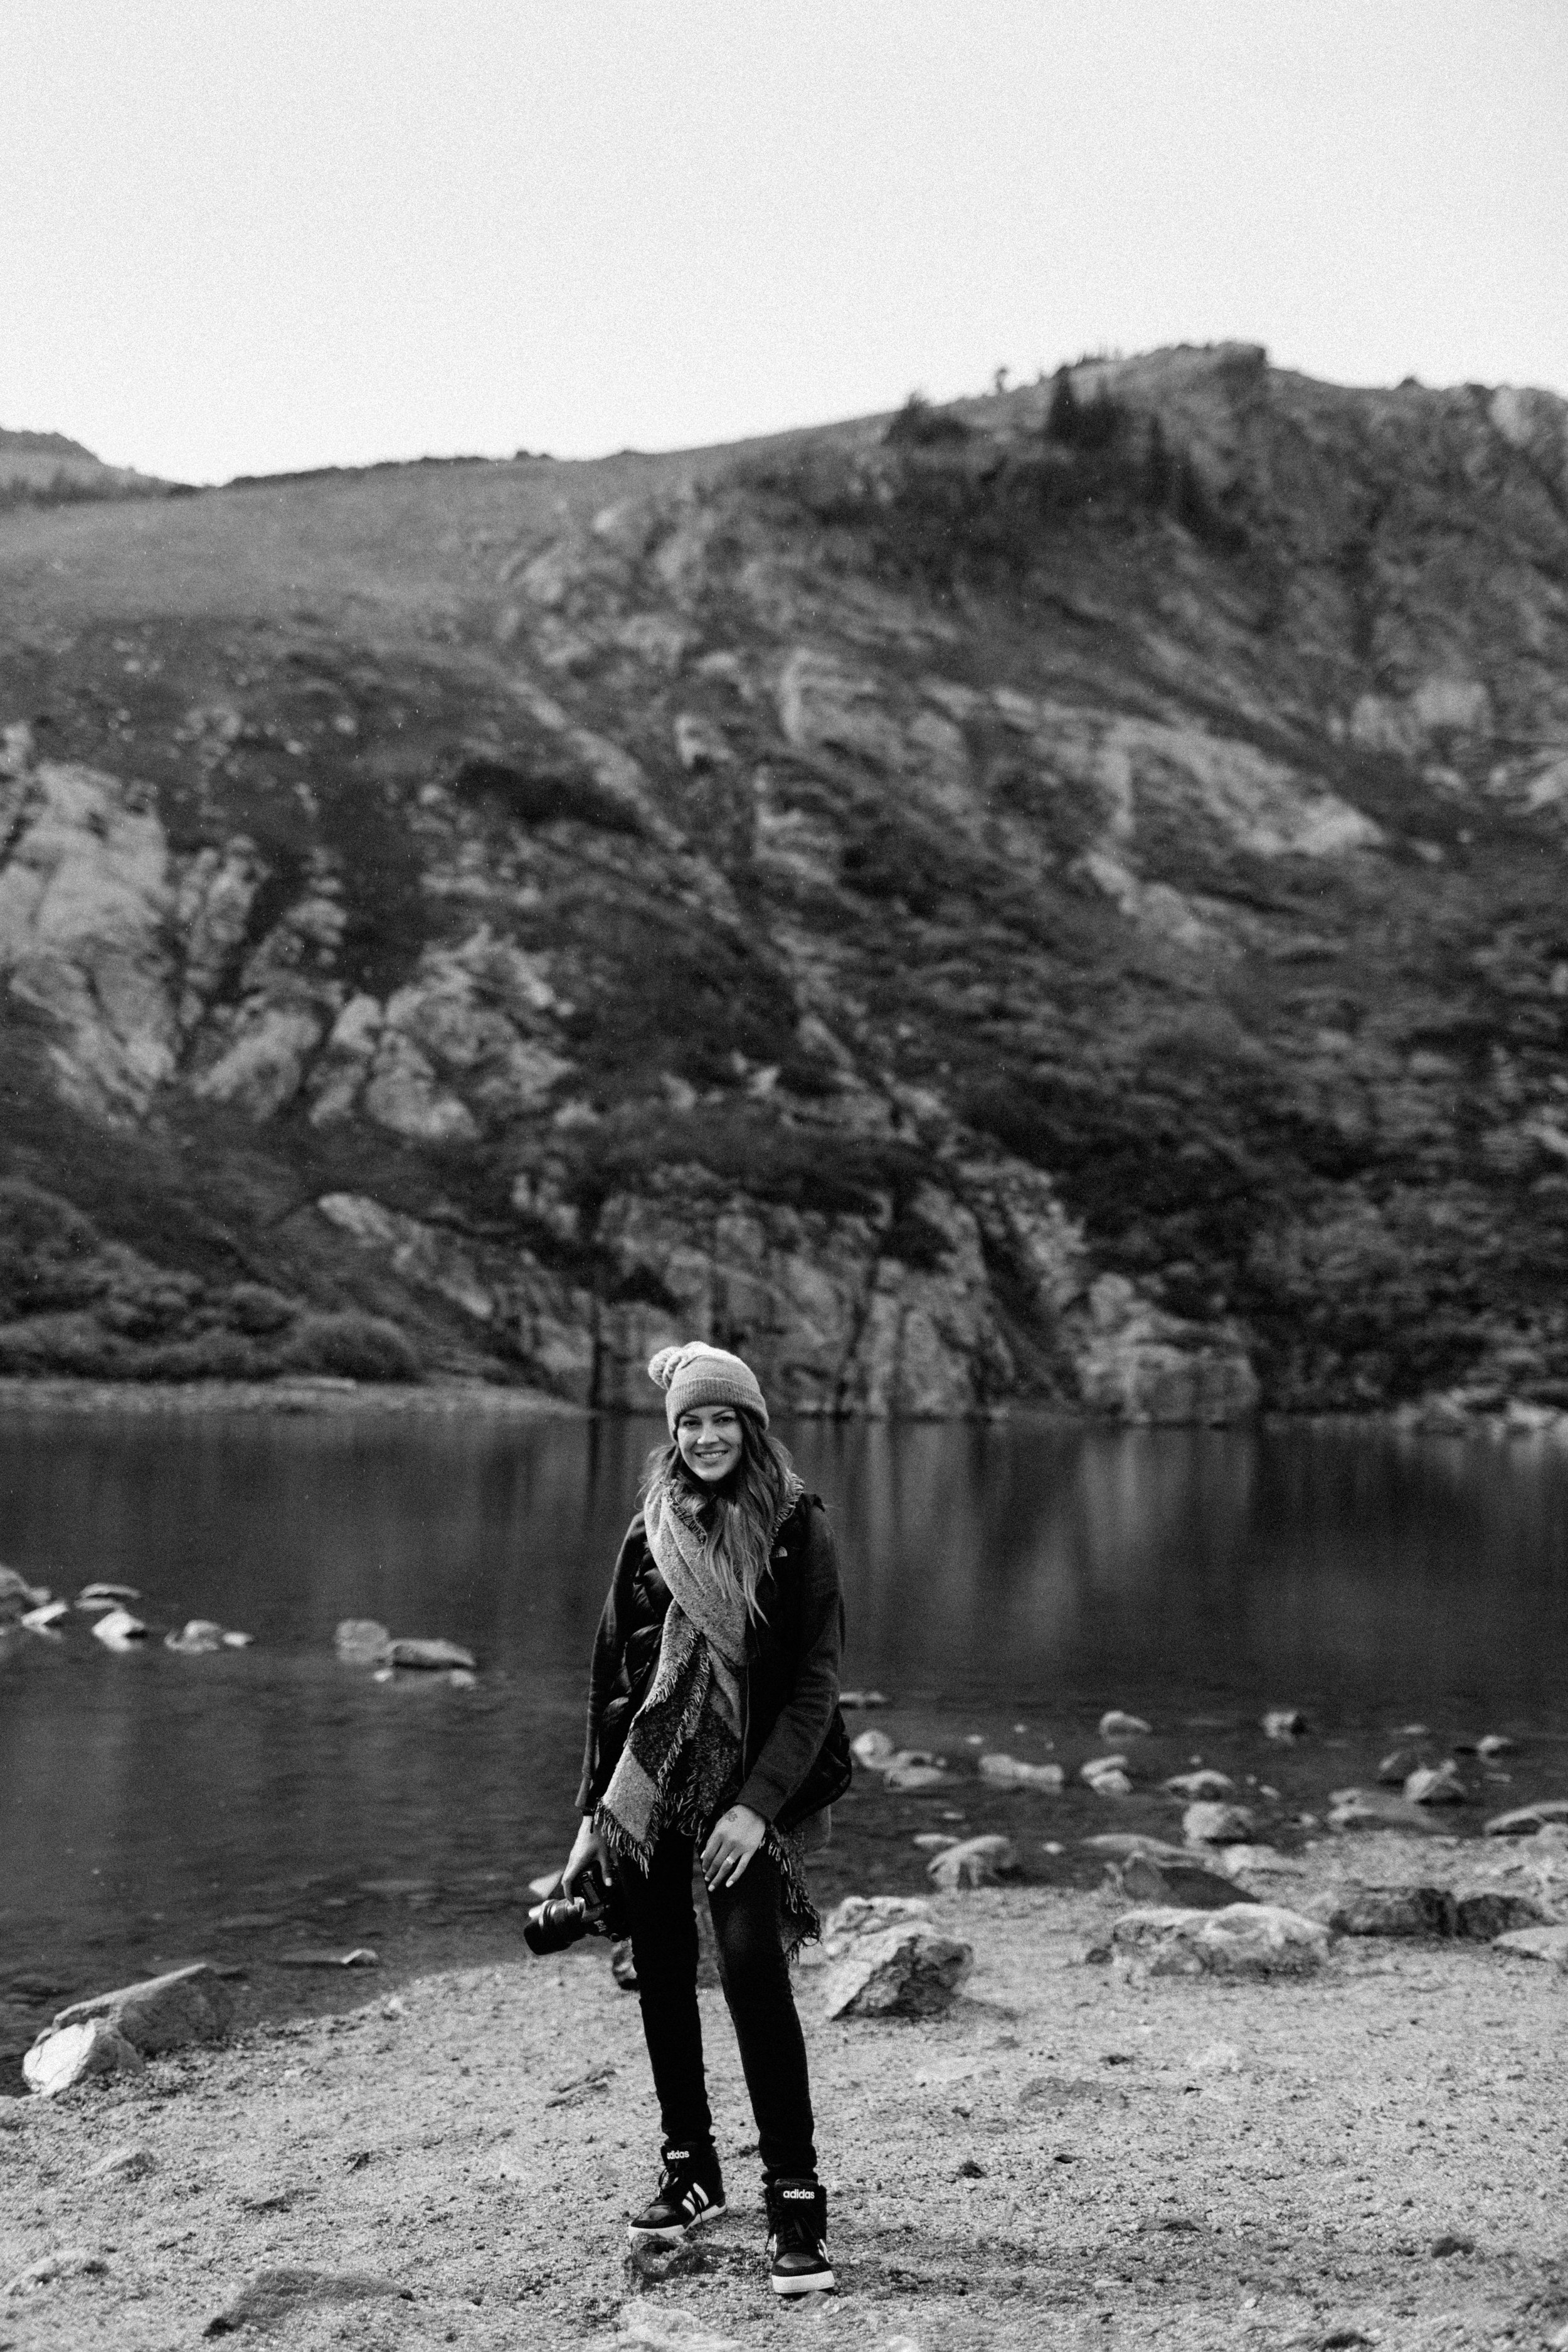 Adventurous Mountain Elopement and Destination Wedding Photographer in Colorado, Utah, Joshua Tree, Napa